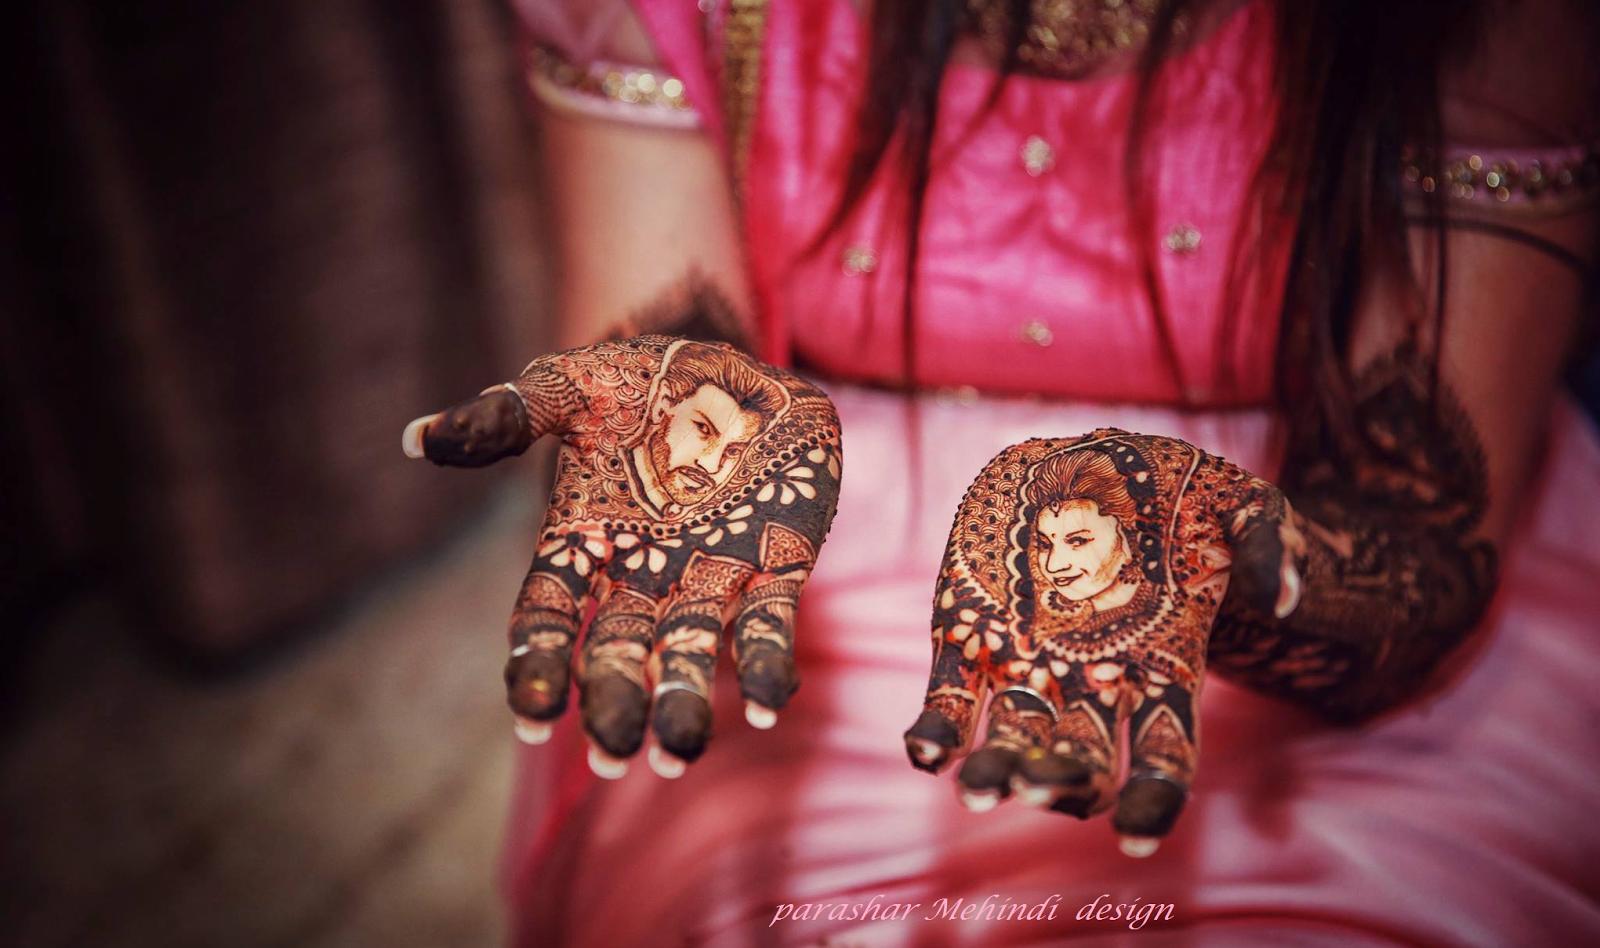 Mehndi Ceremony Description : The mehndi design tattos henna art bridal modern stylish